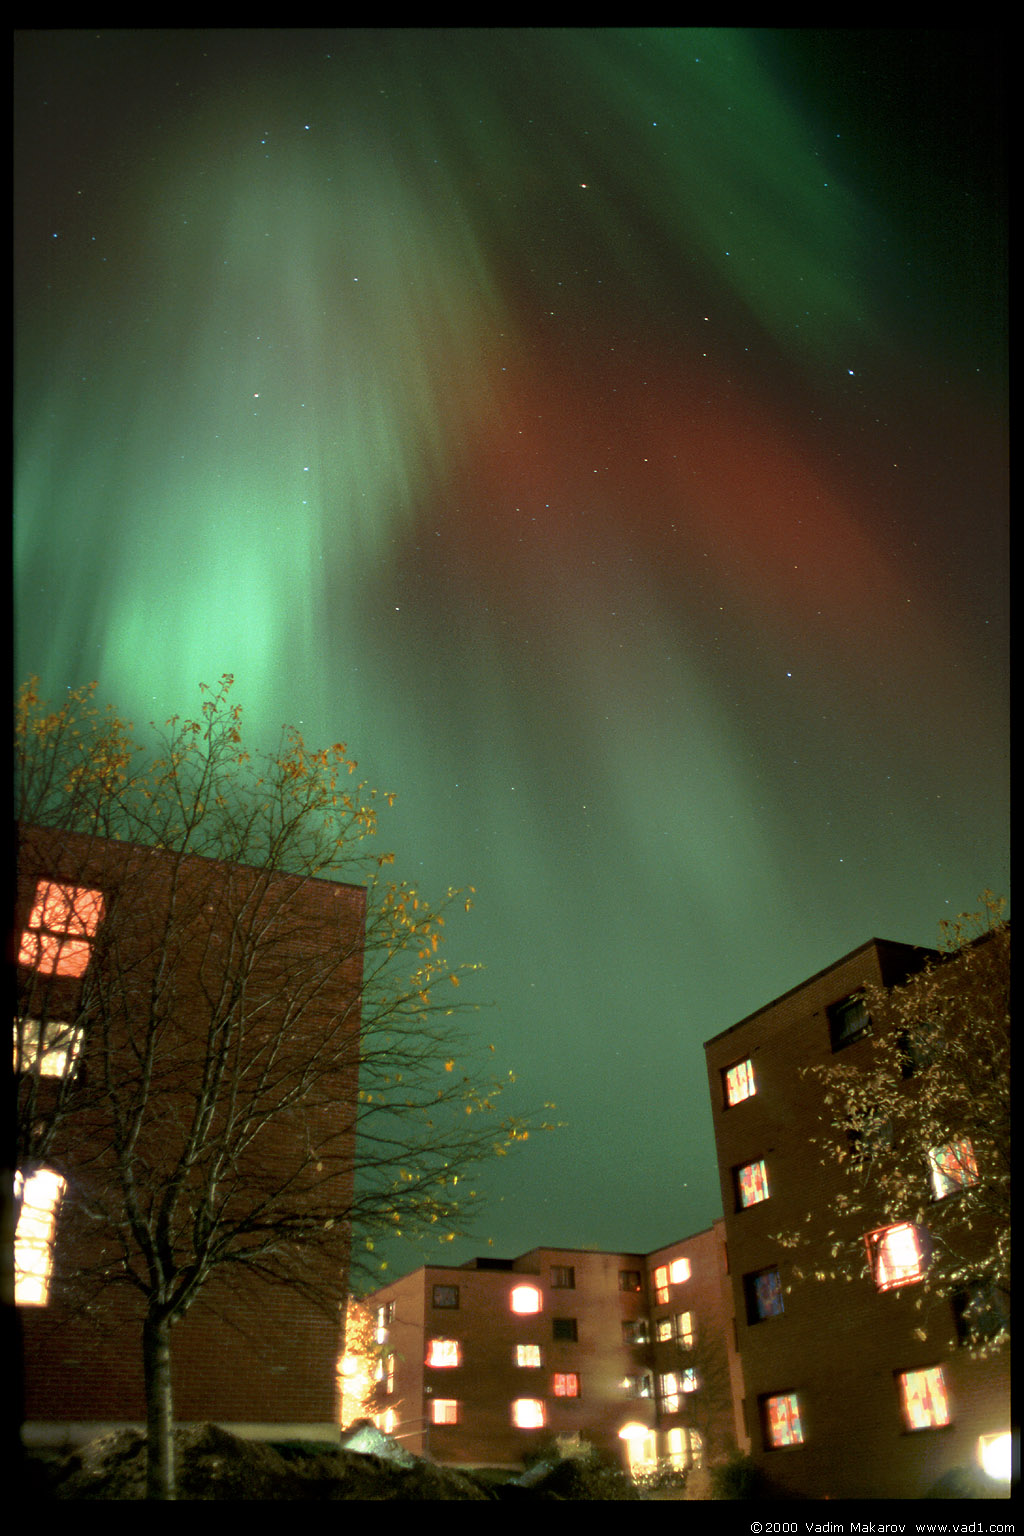 Photo: Northern lights over Moholt student village